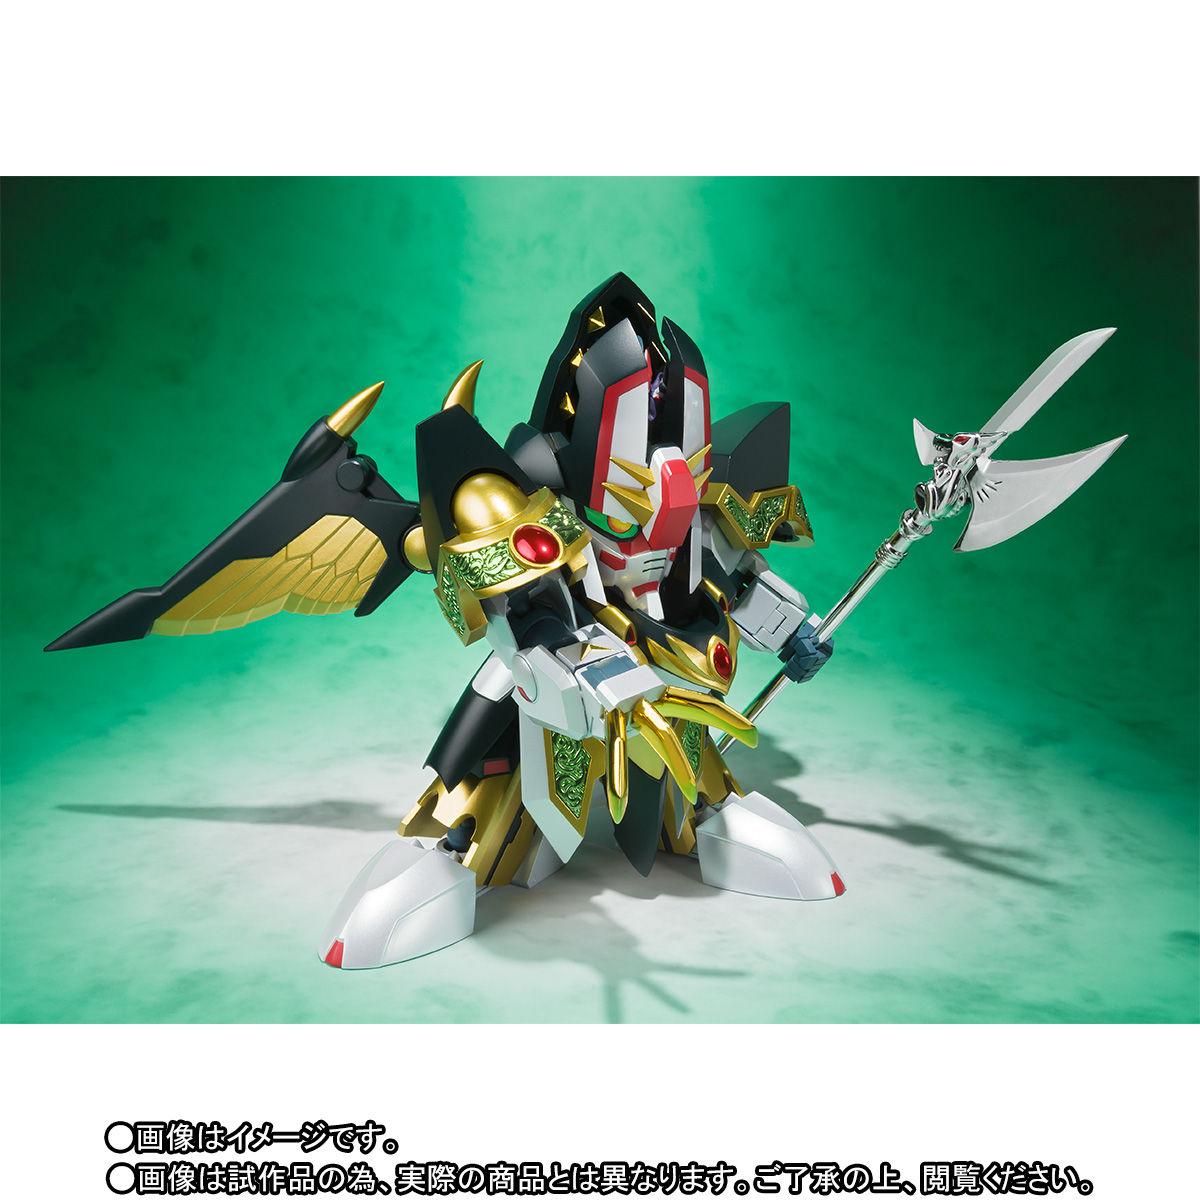 SDX『龍機ドラグーン|新SDガンダム外伝』可変可動フィギュア-004